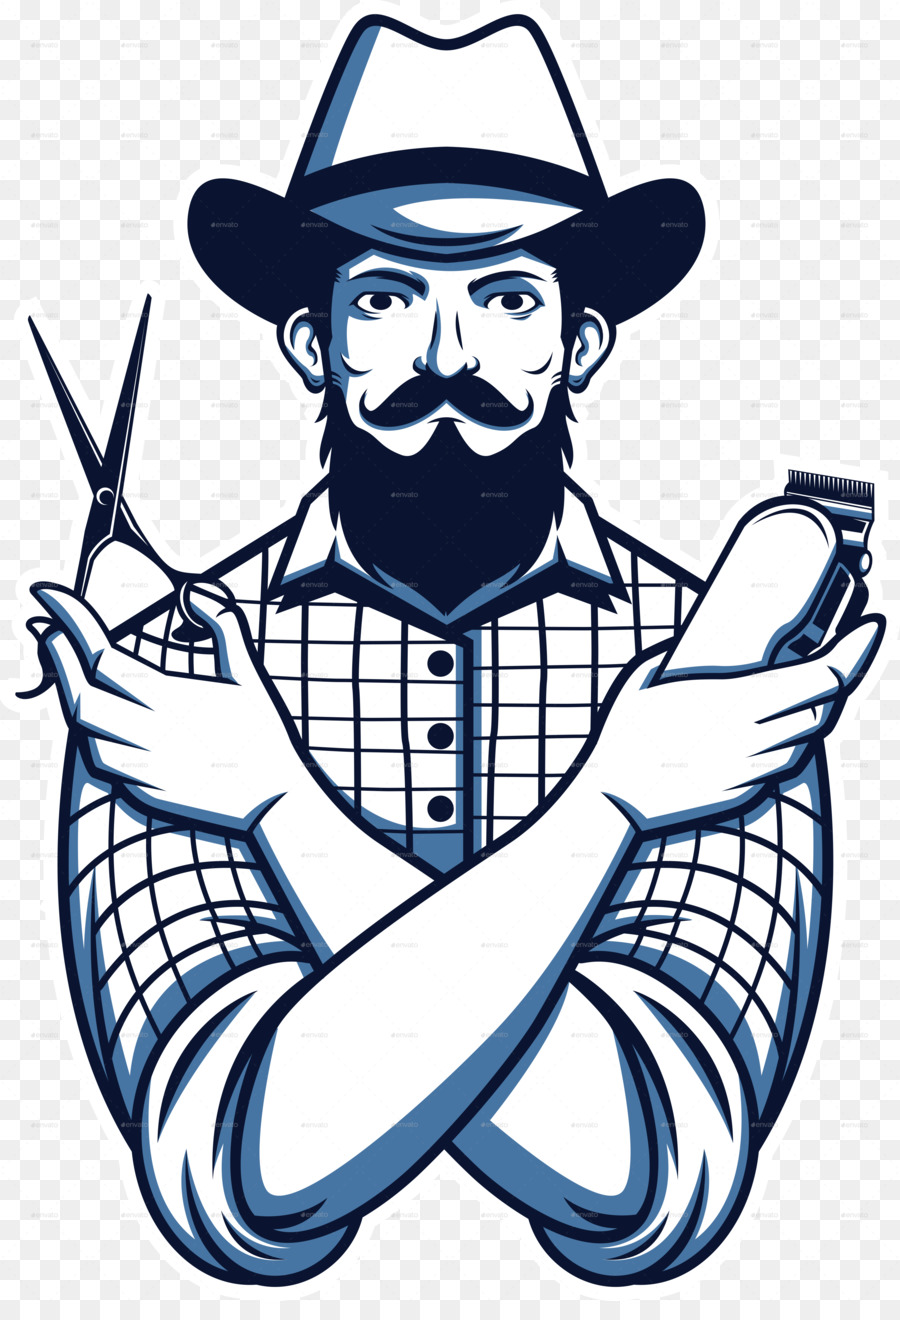 Barber clipart transparent. Barbershop hairstyle shaving beard